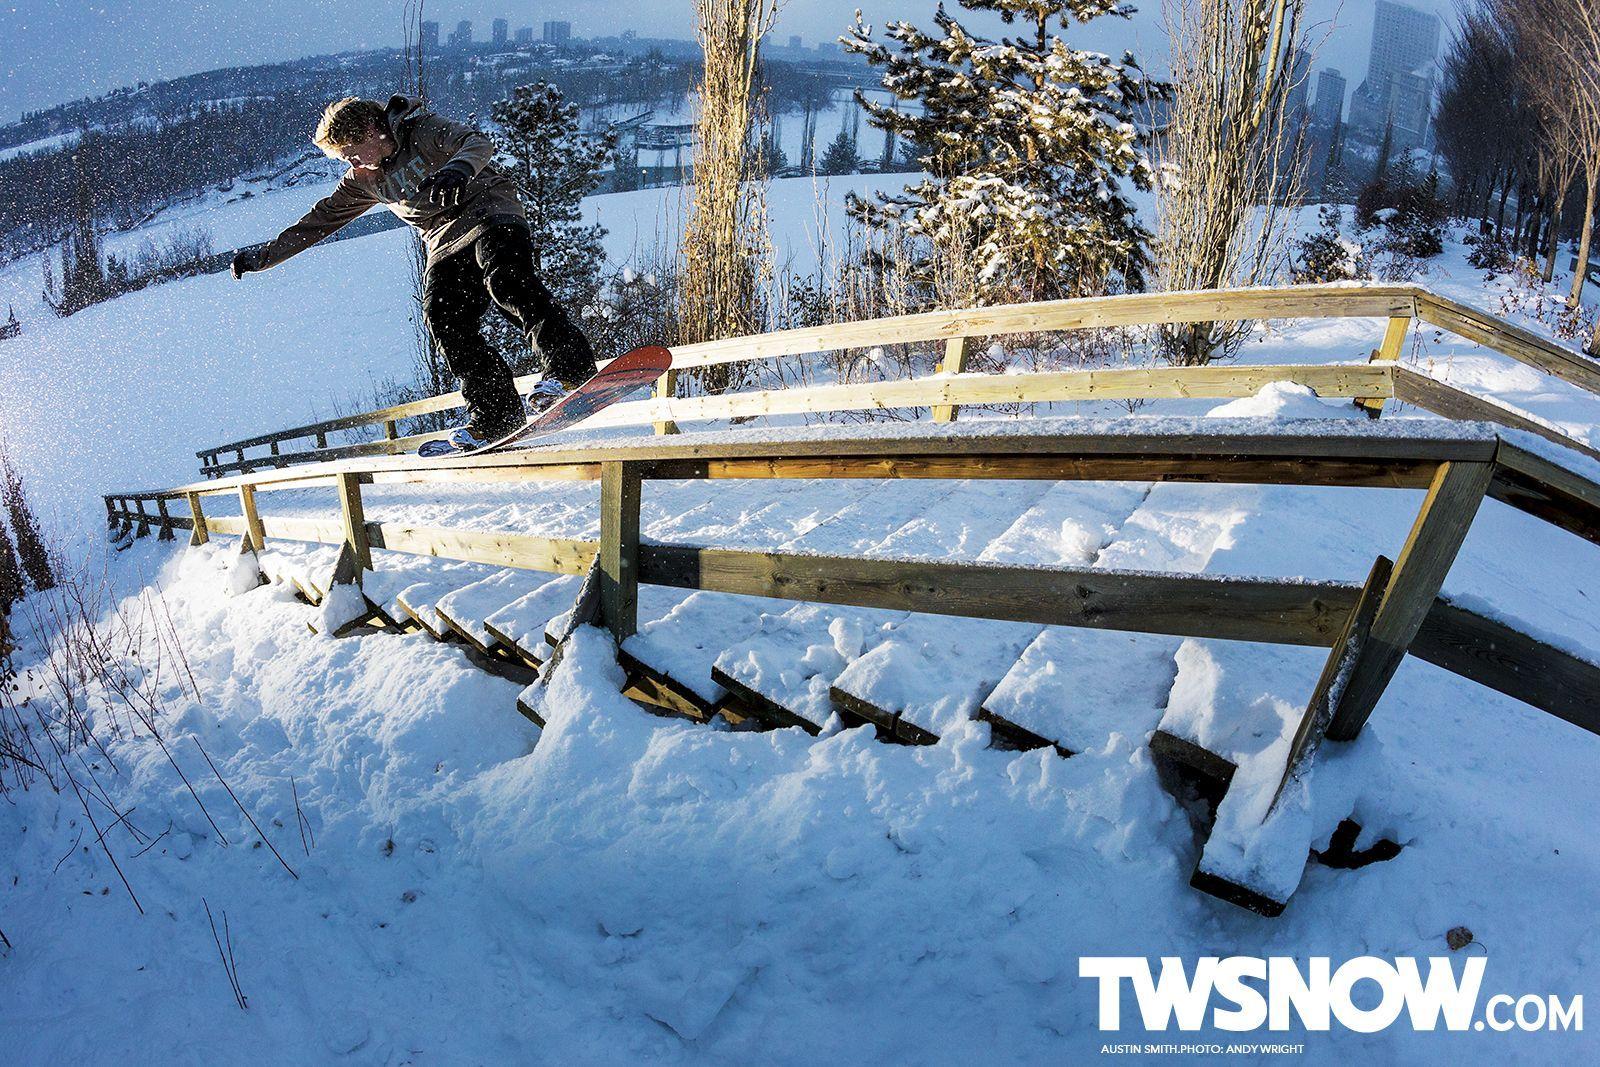 Austin Smith Snowboarding Some Rails Trend In 2020 Transworld Snowboarding Snowboarding Photography Snowboarding